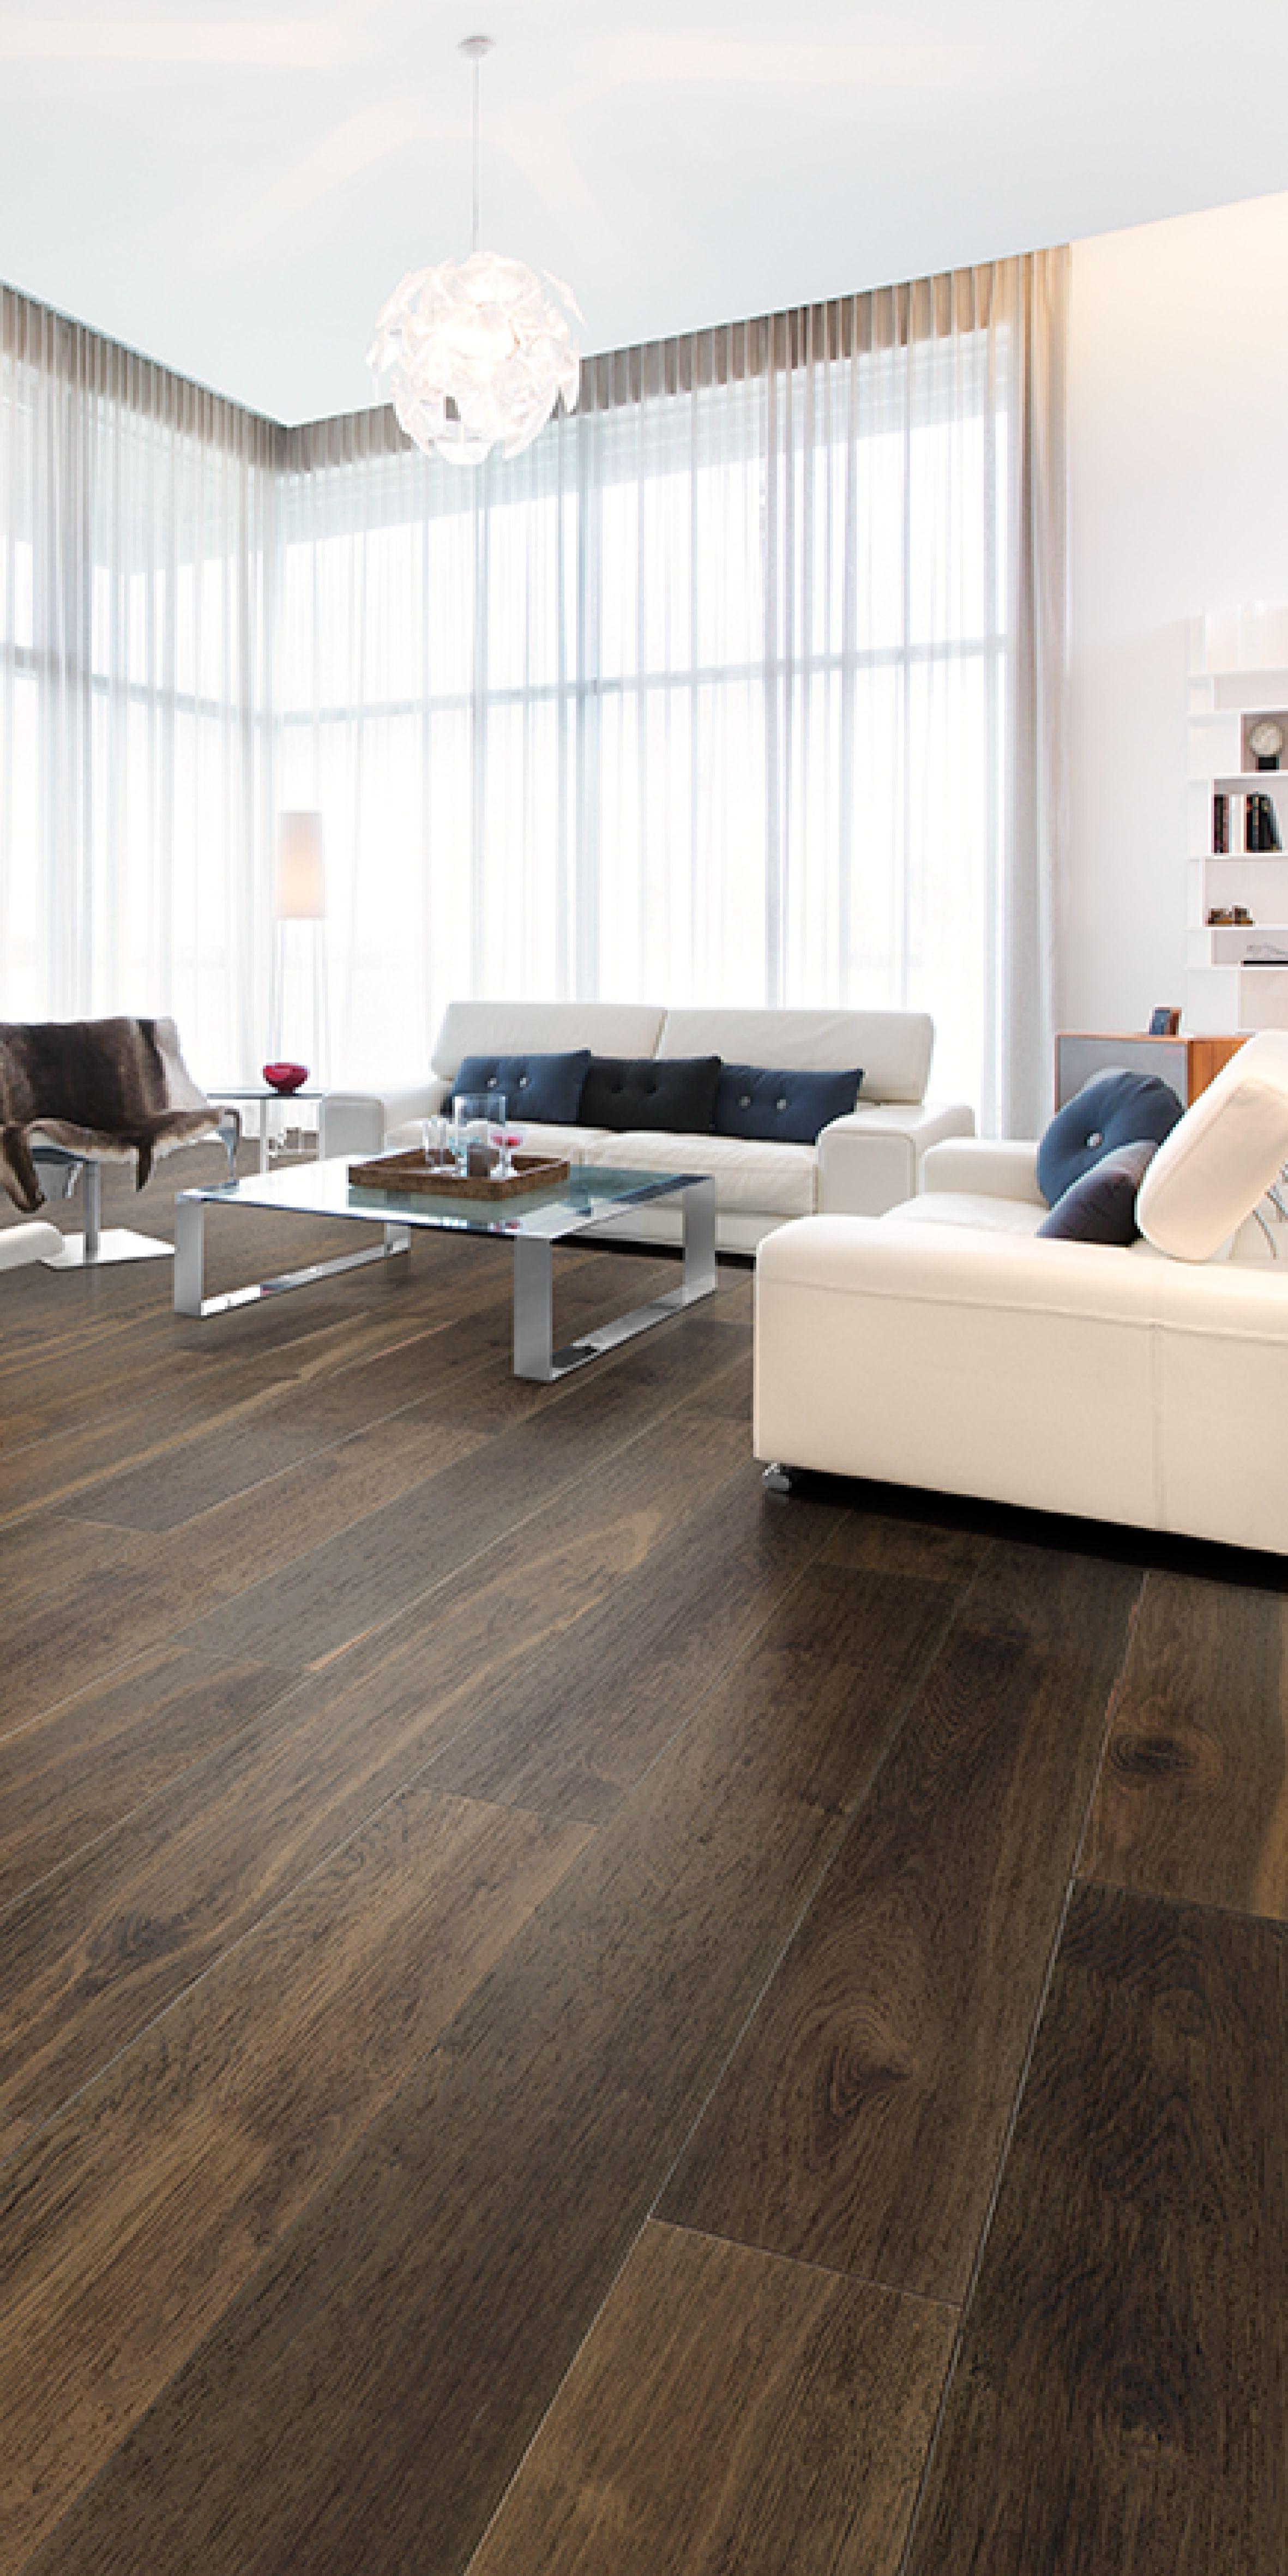 Wood flooring, flooring and interior design on pinterest